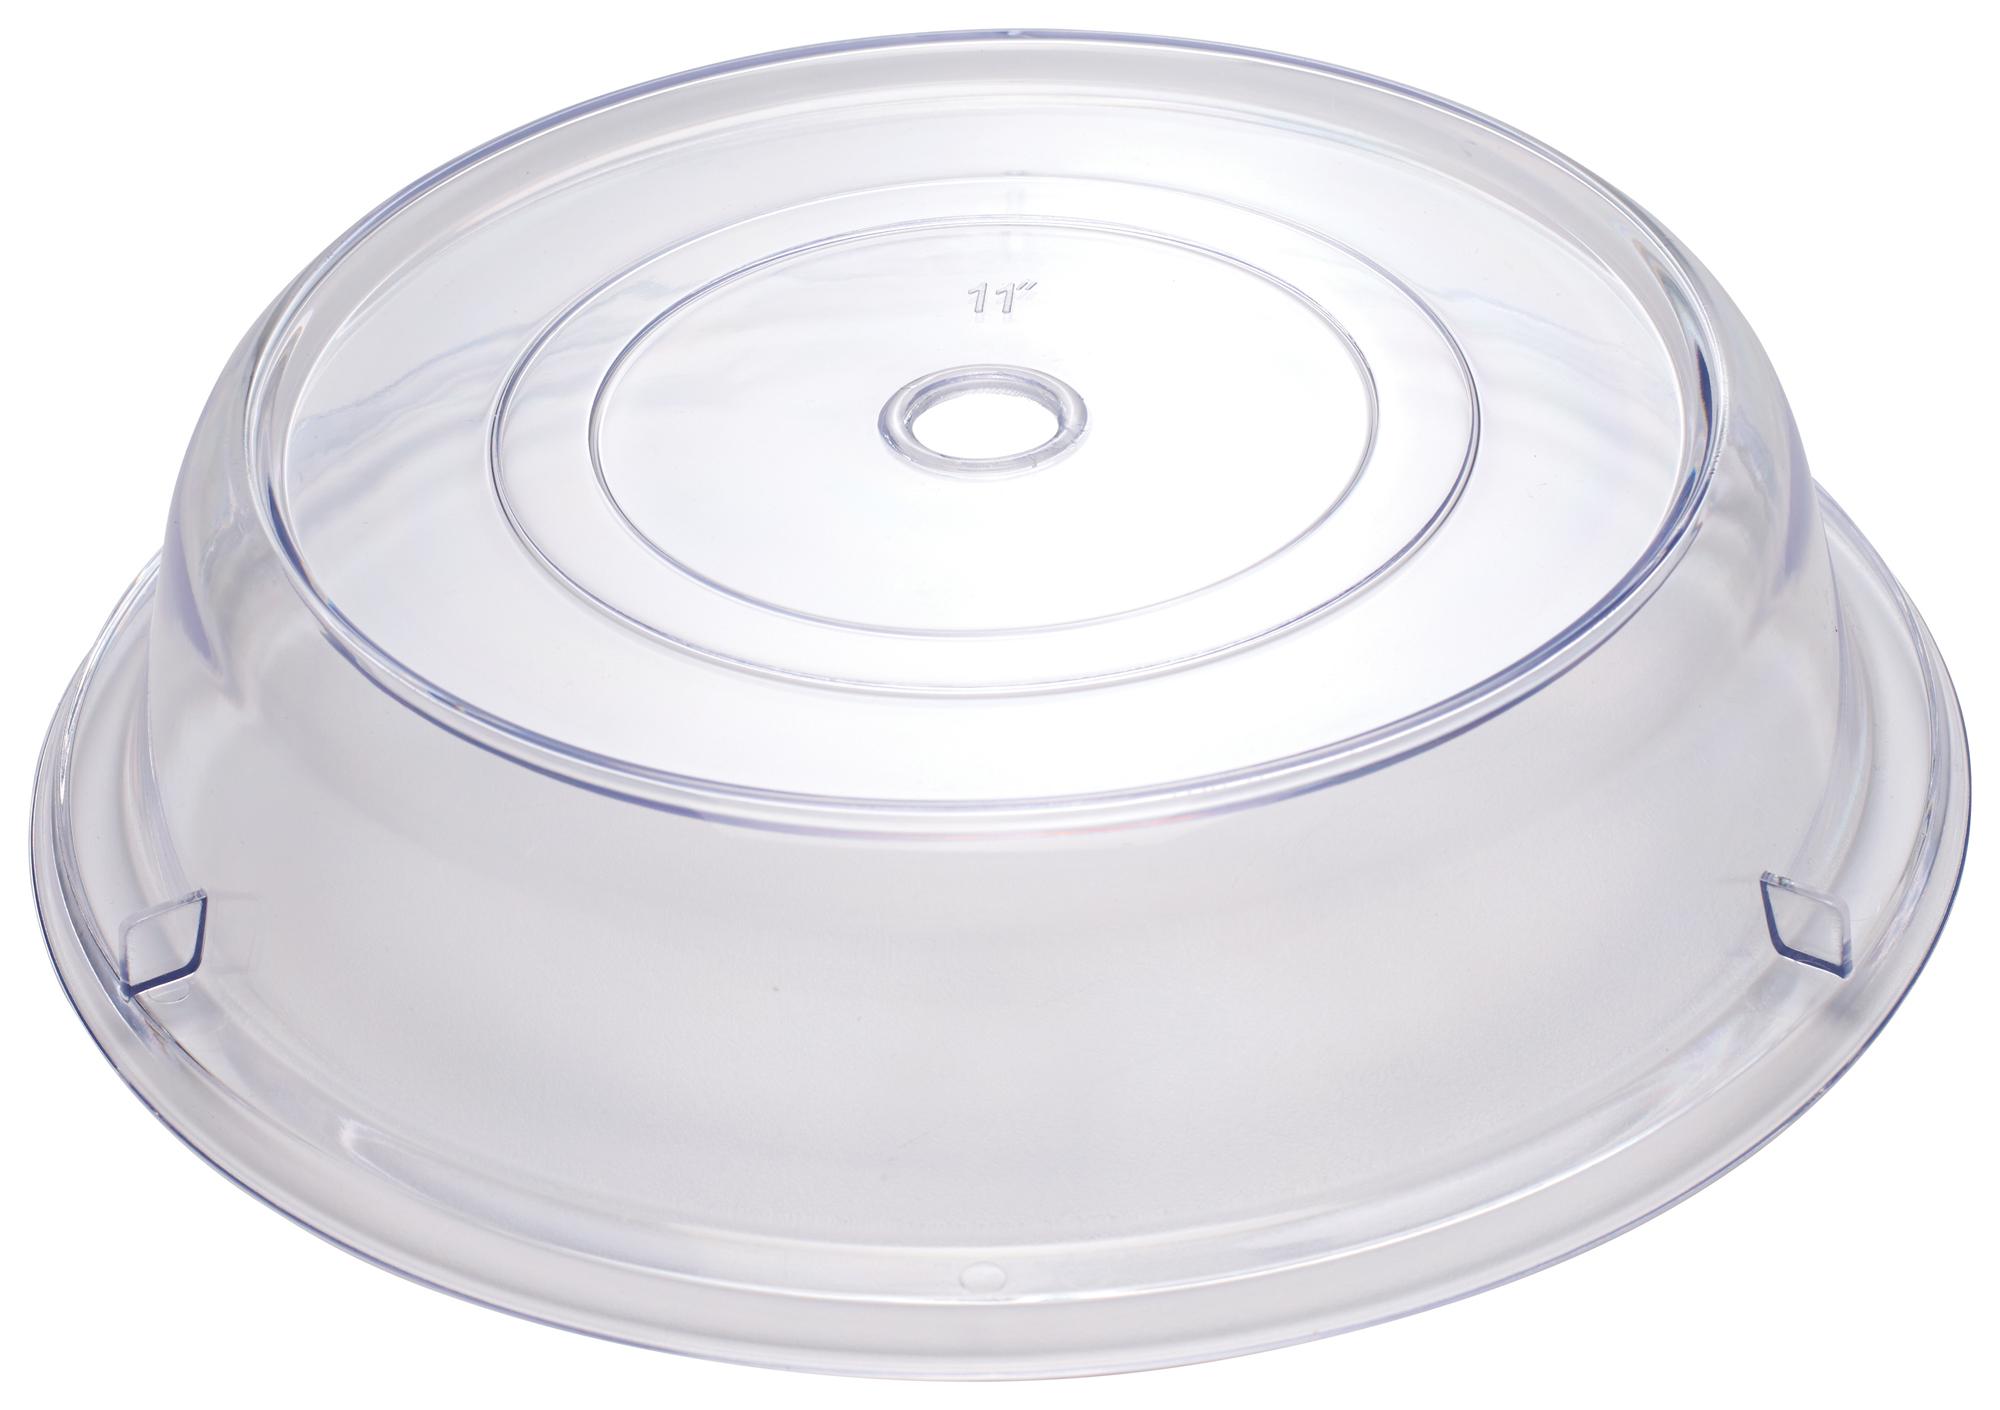 Winco PPCR-11 round plate cover